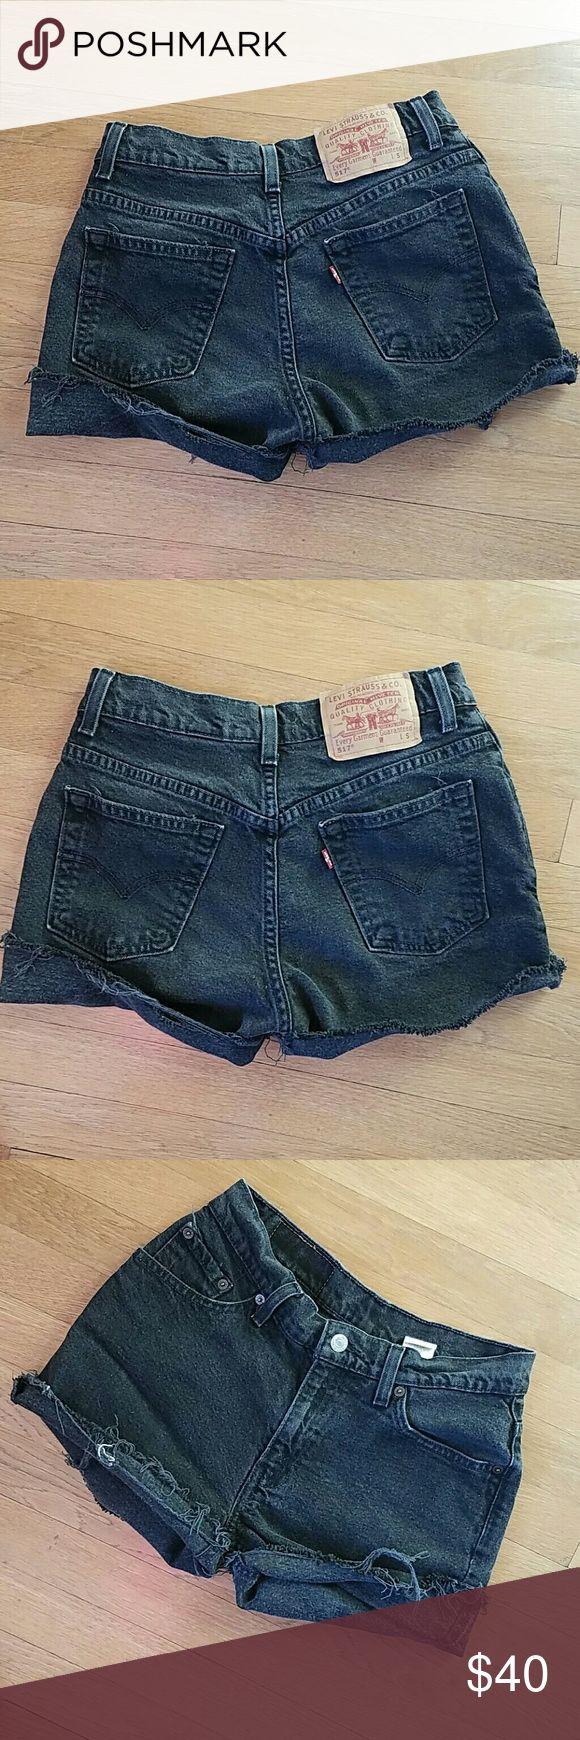 "Levi's 517 vintage cut off shorts 26"" hand measured waist, 3"" inseam, 9 1/2"" rise, tagged 7 Jr Levi's Shorts Jean Shorts"